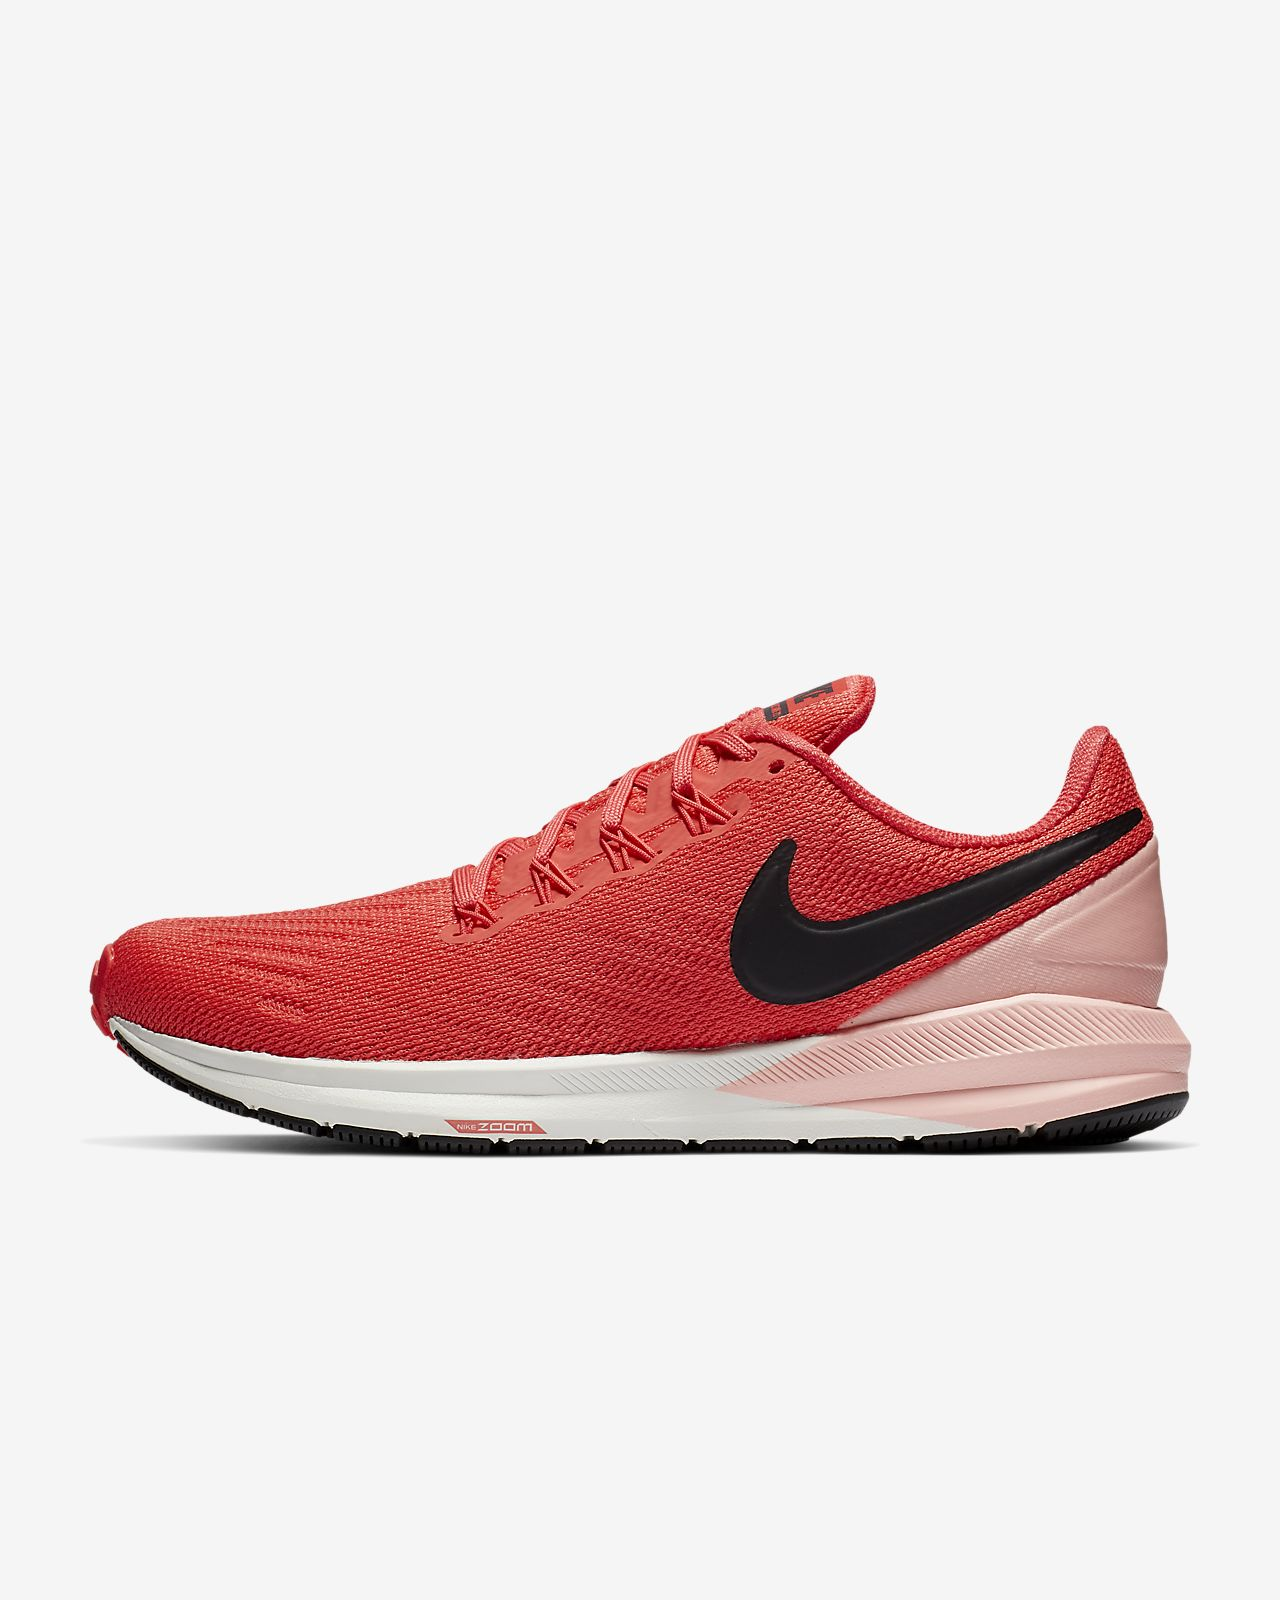 63299165a77 Γυναικείο παπούτσι για τρέξιμο Nike Air Zoom Structure 22. Nike.com GR